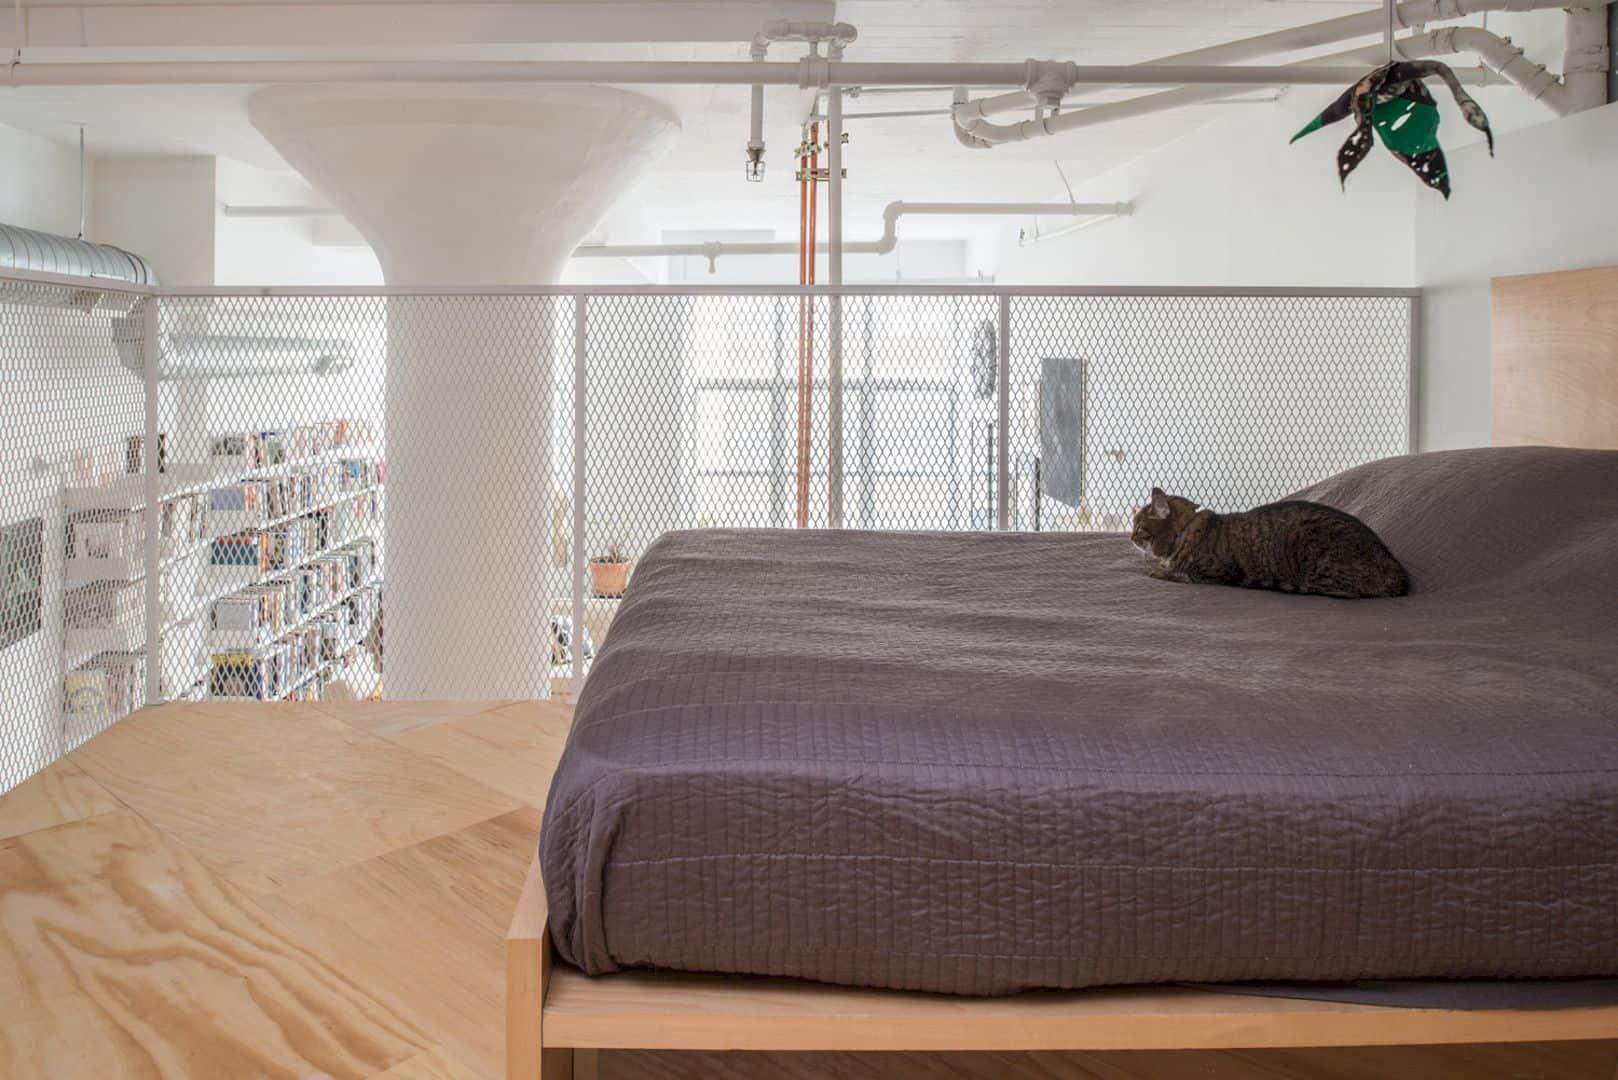 Bed Stuy Loft 8